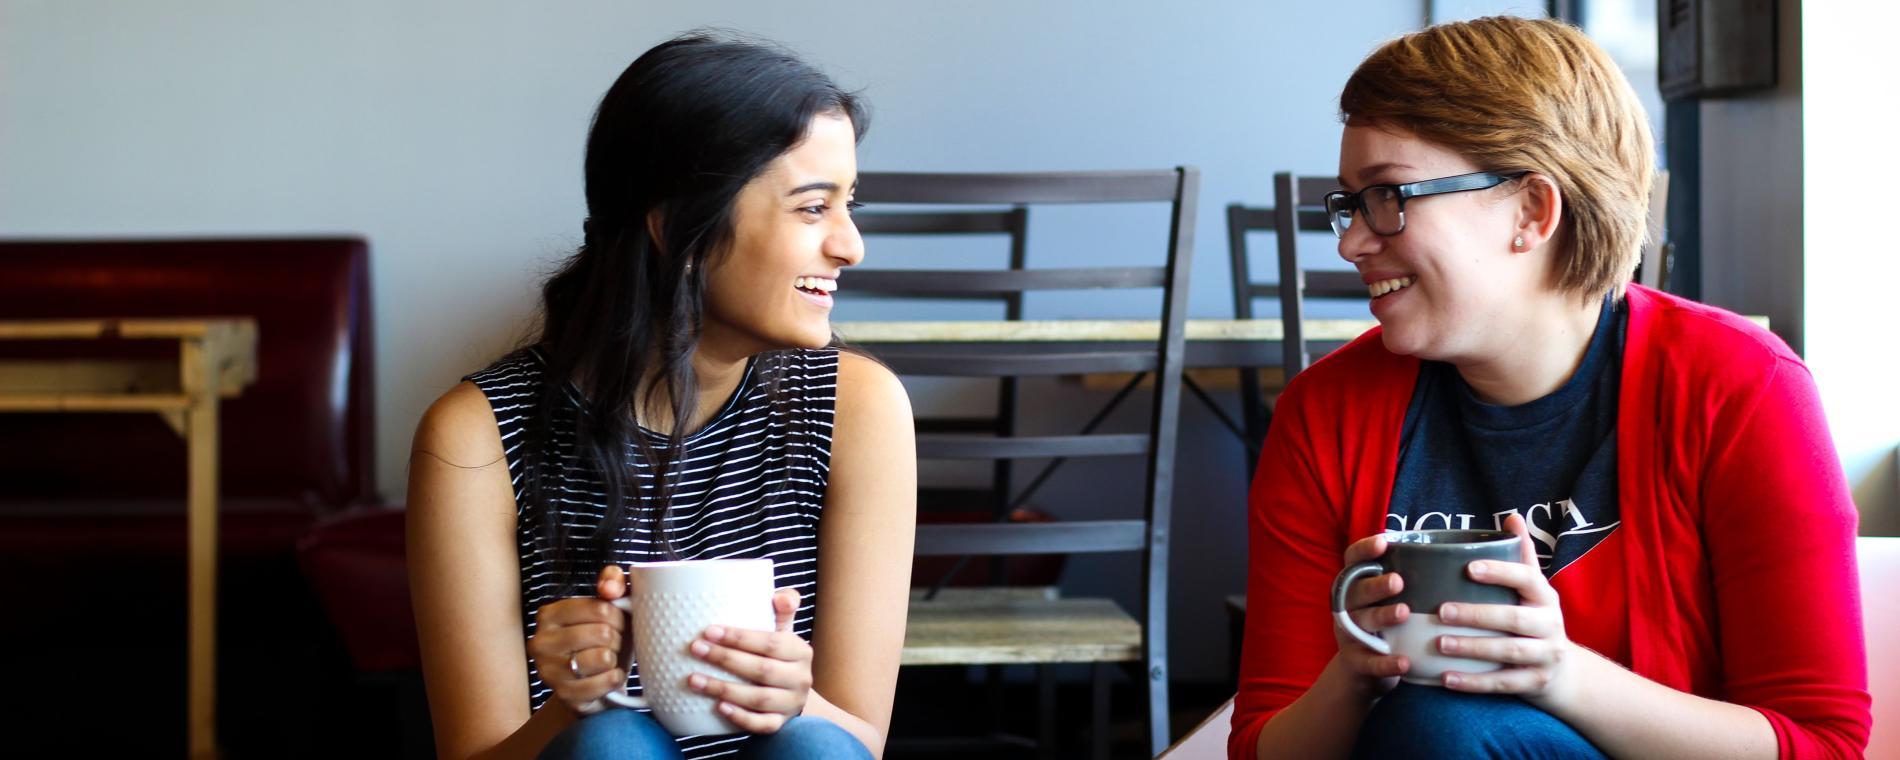 Ecclesia Coffee with friend Visit Wichita